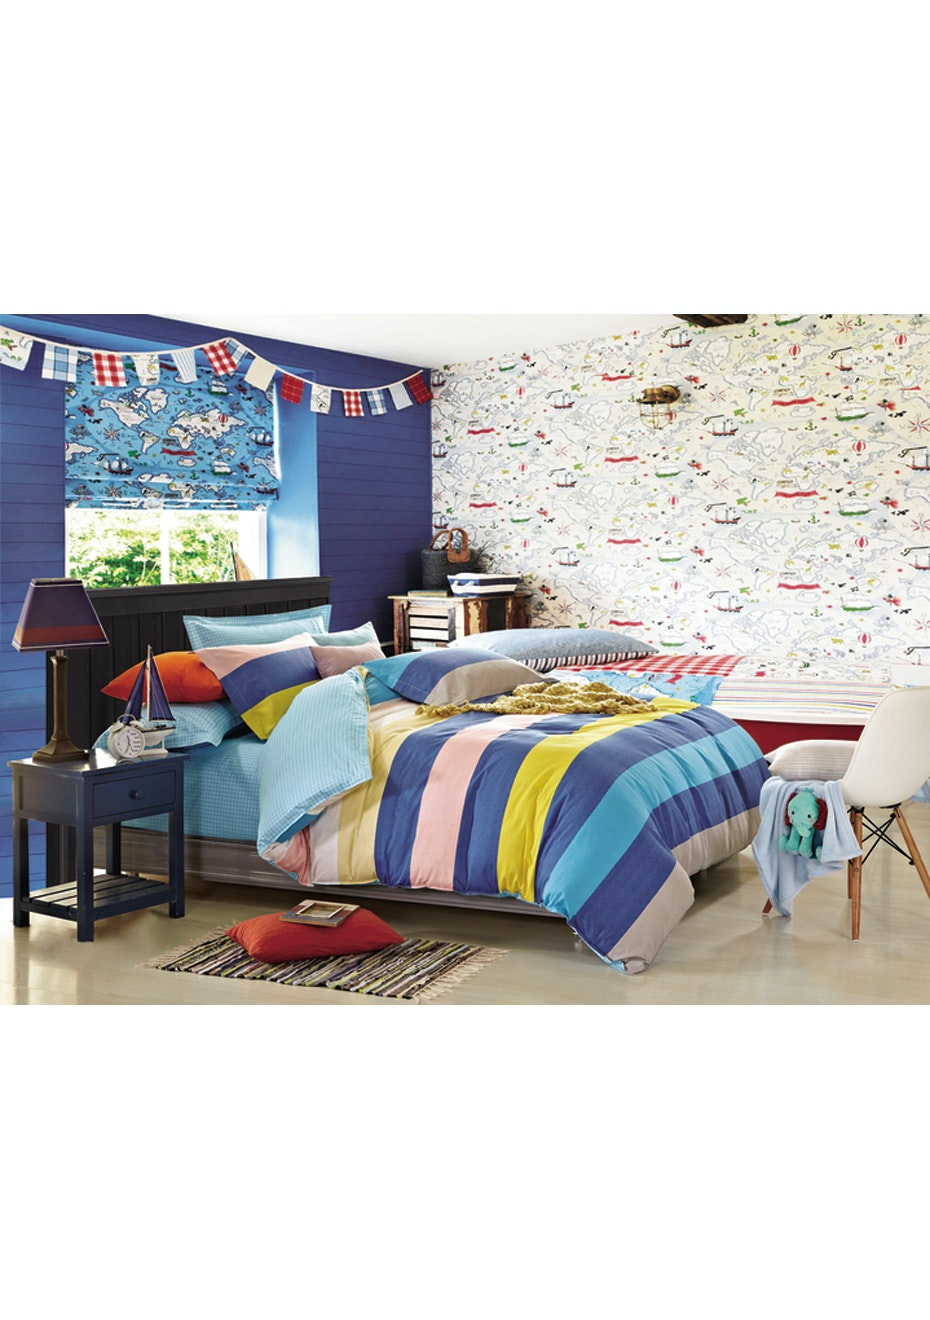 Carter Quilt Cover Set - Reversible Design - 100% Cotton - Single Bed